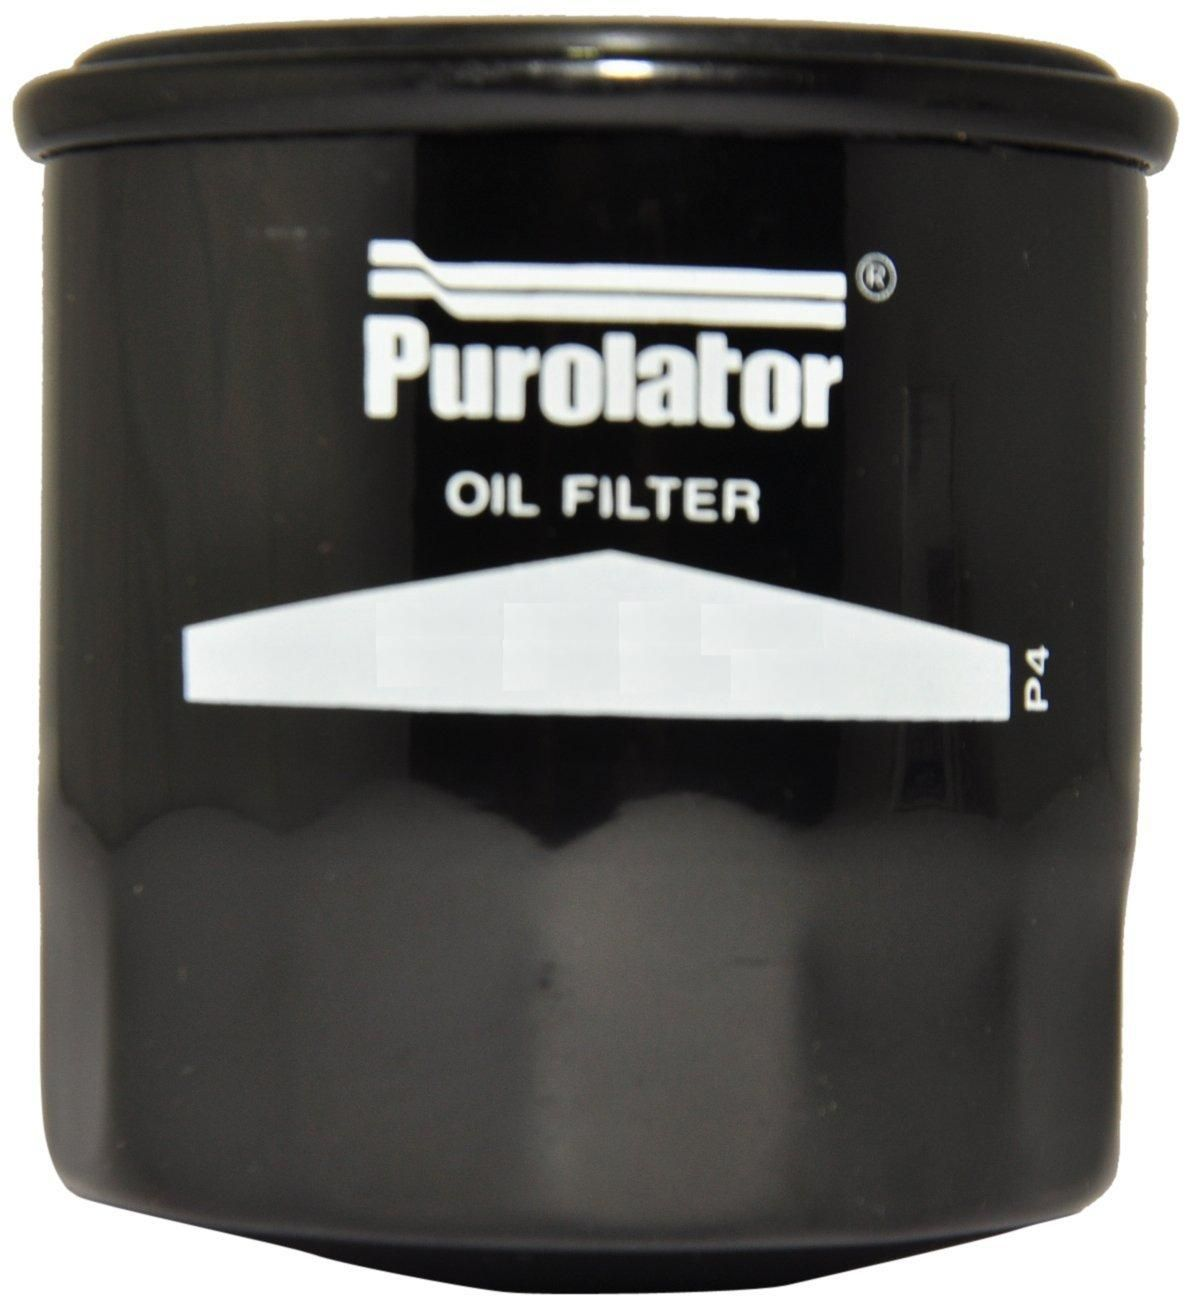 PUROLATOR-CAR-OIL FILTER FOR FIAT UNO A/C(DIESEL)/SIENA A/C(DIESEL)